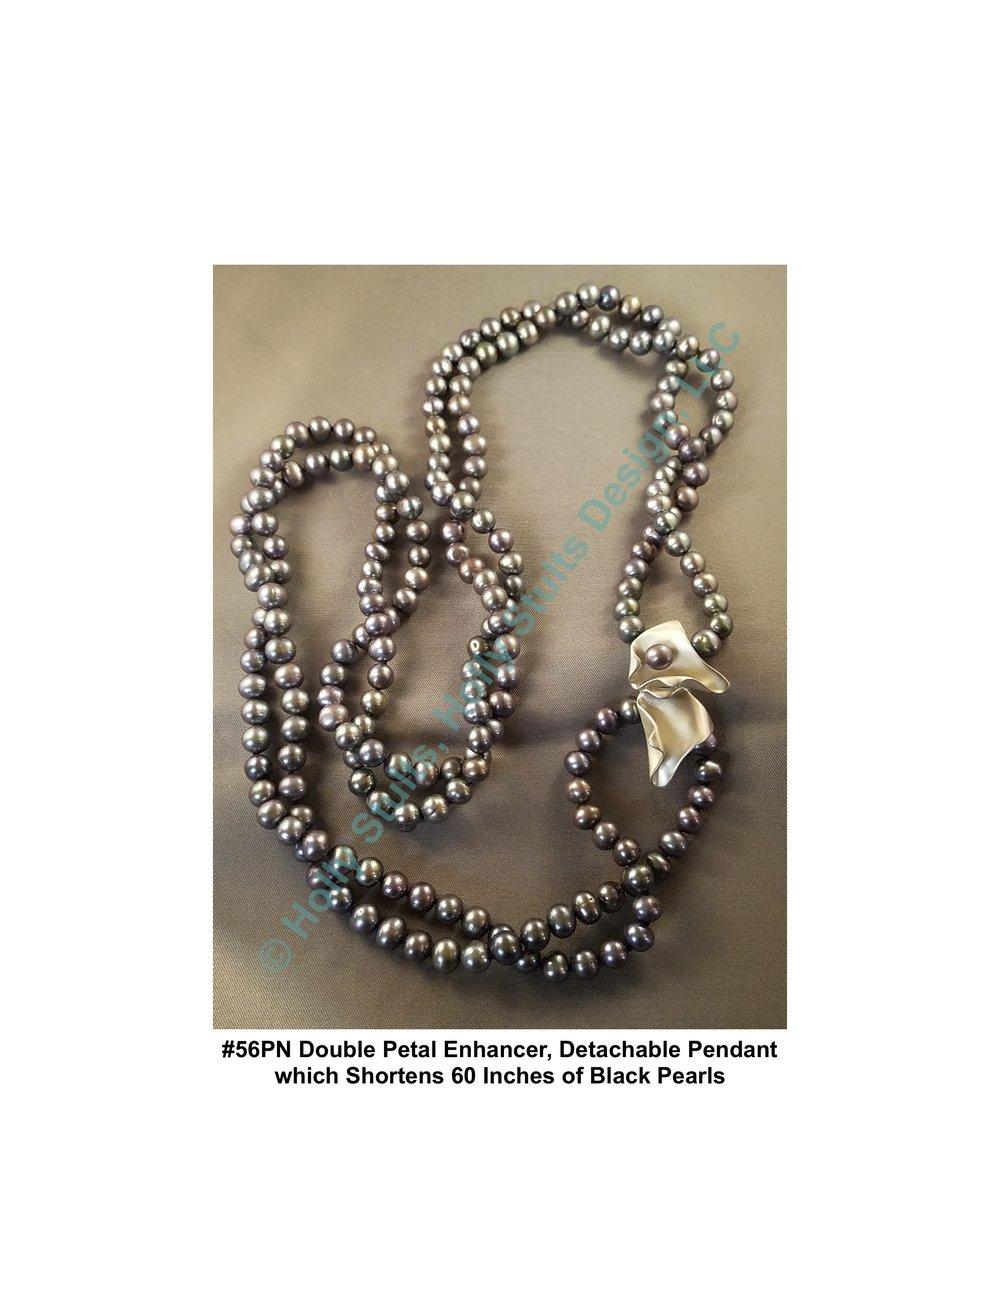 #56PN Double Petal Enhancer, Detachable Pendant which Shortens 60 Inches of Black Pearls.jpg